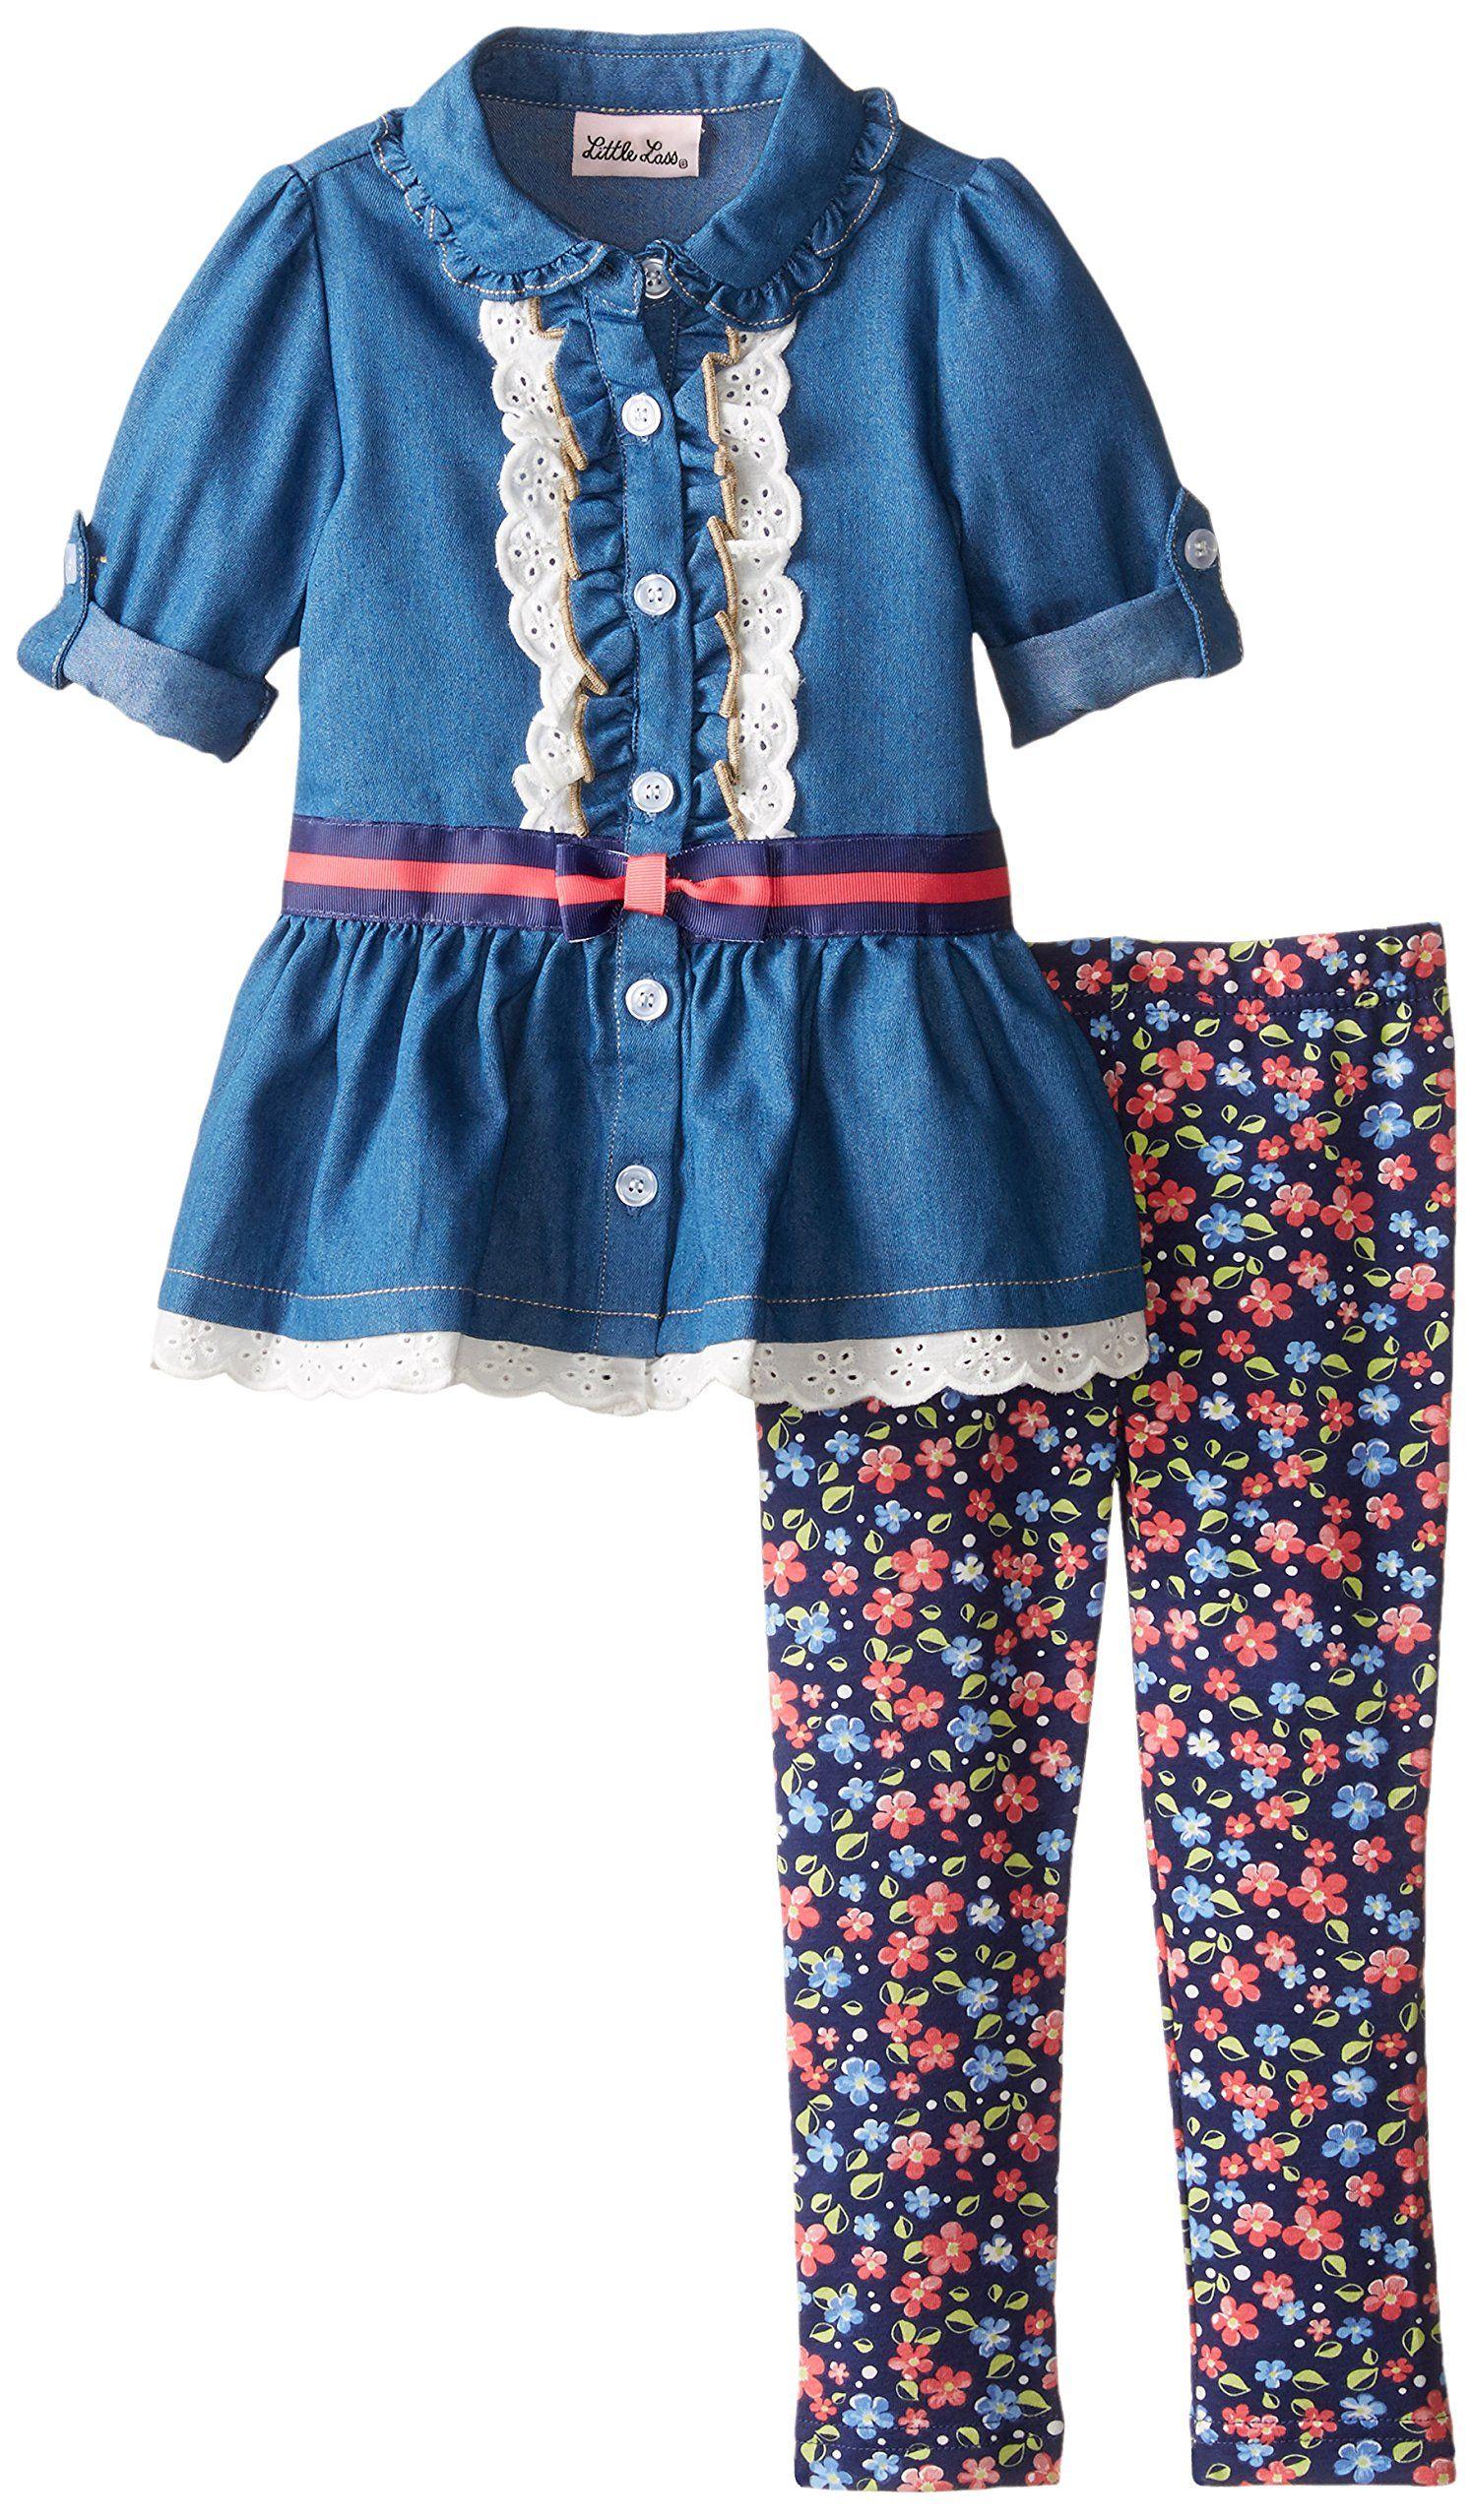 adb968c00171 Little Lass Little Girls  2 Piece Legging Set Chambray Lace Trim ...